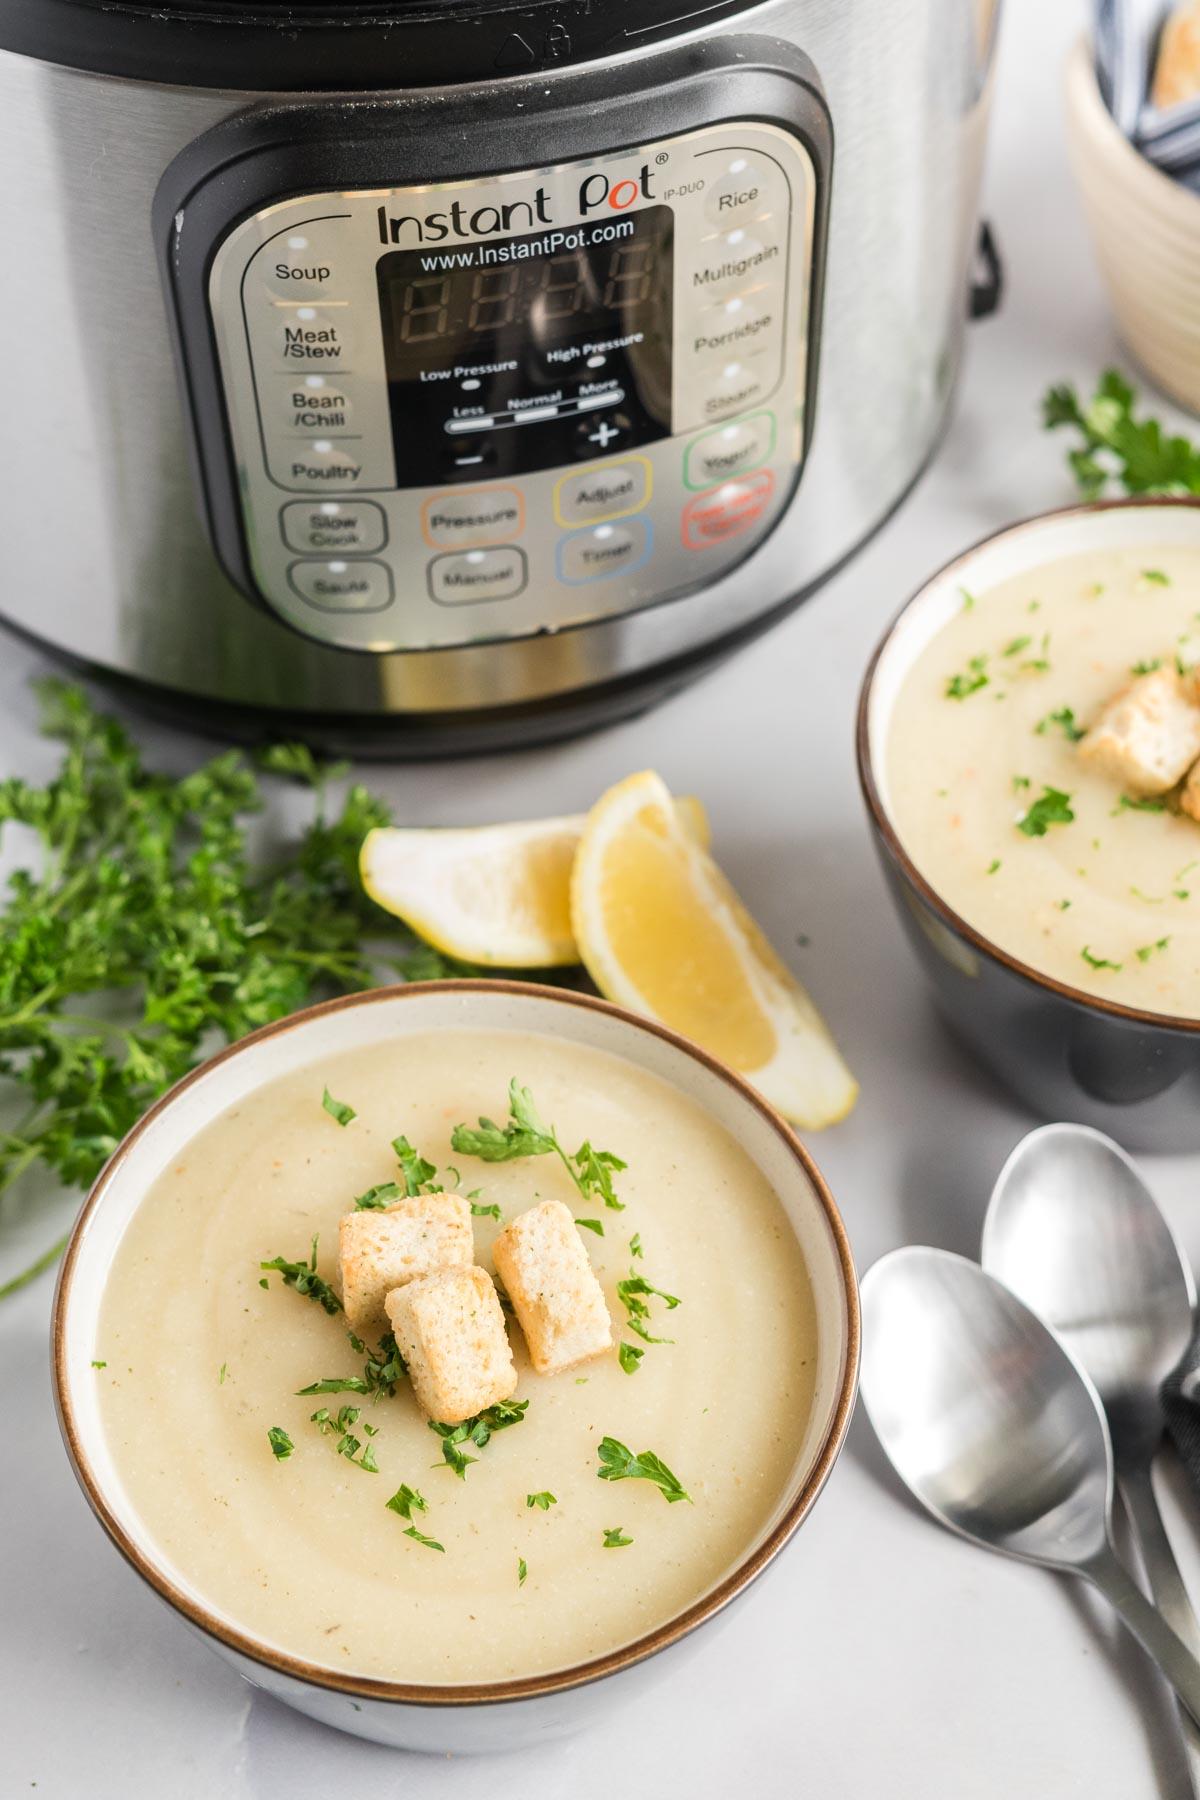 Cauliflower soup in bowls beside an instant pot.